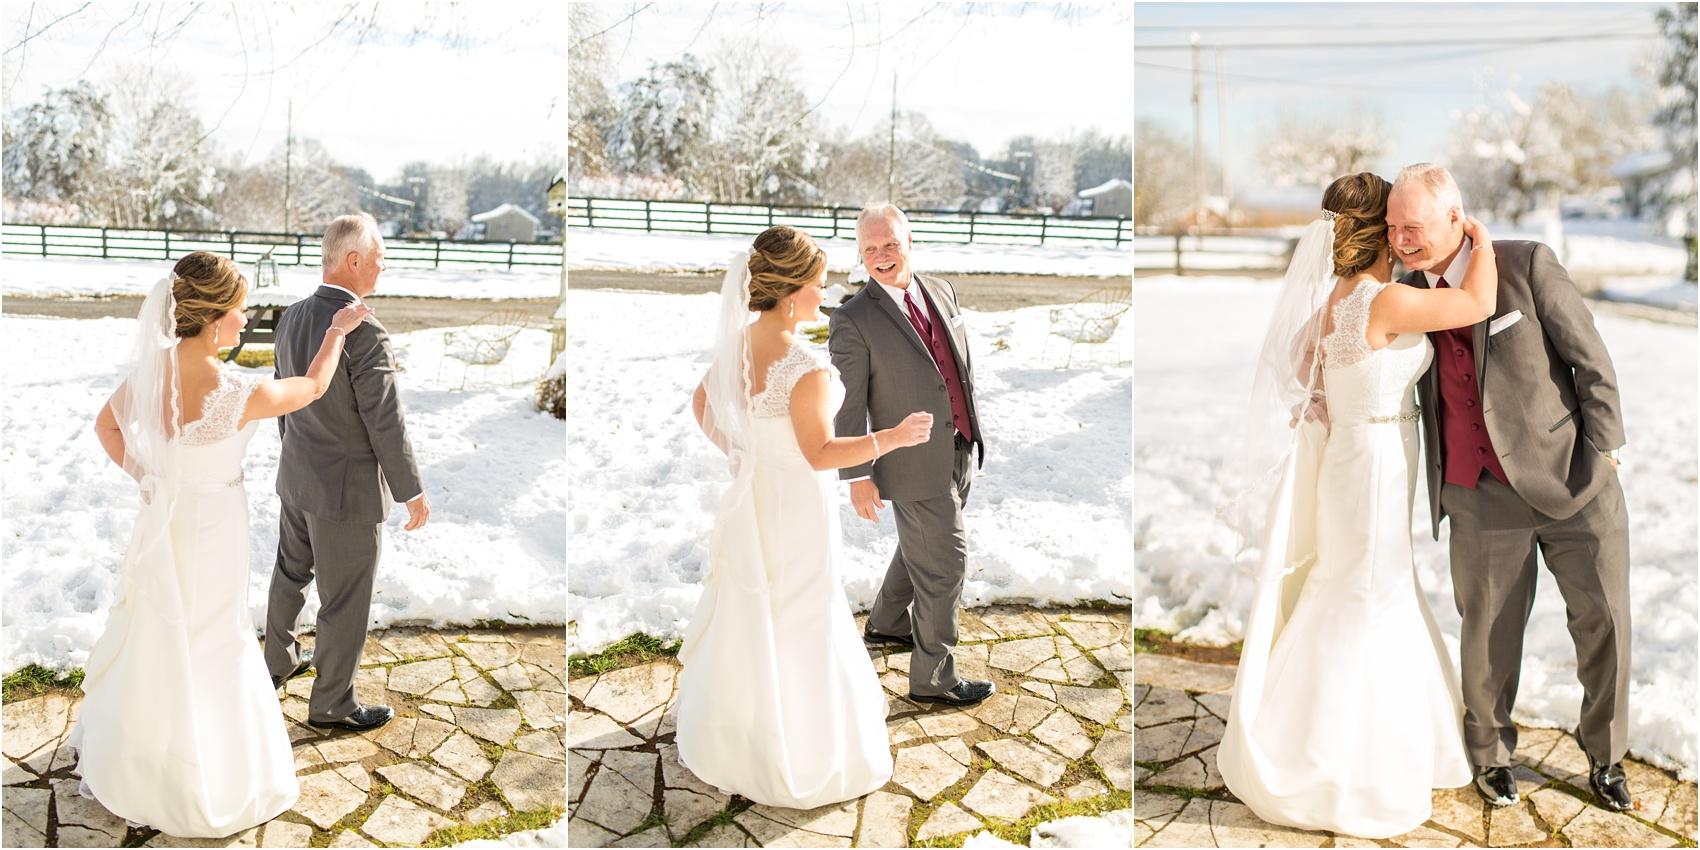 Savannah Eve Photography- Page Wedding Blog-20.jpg